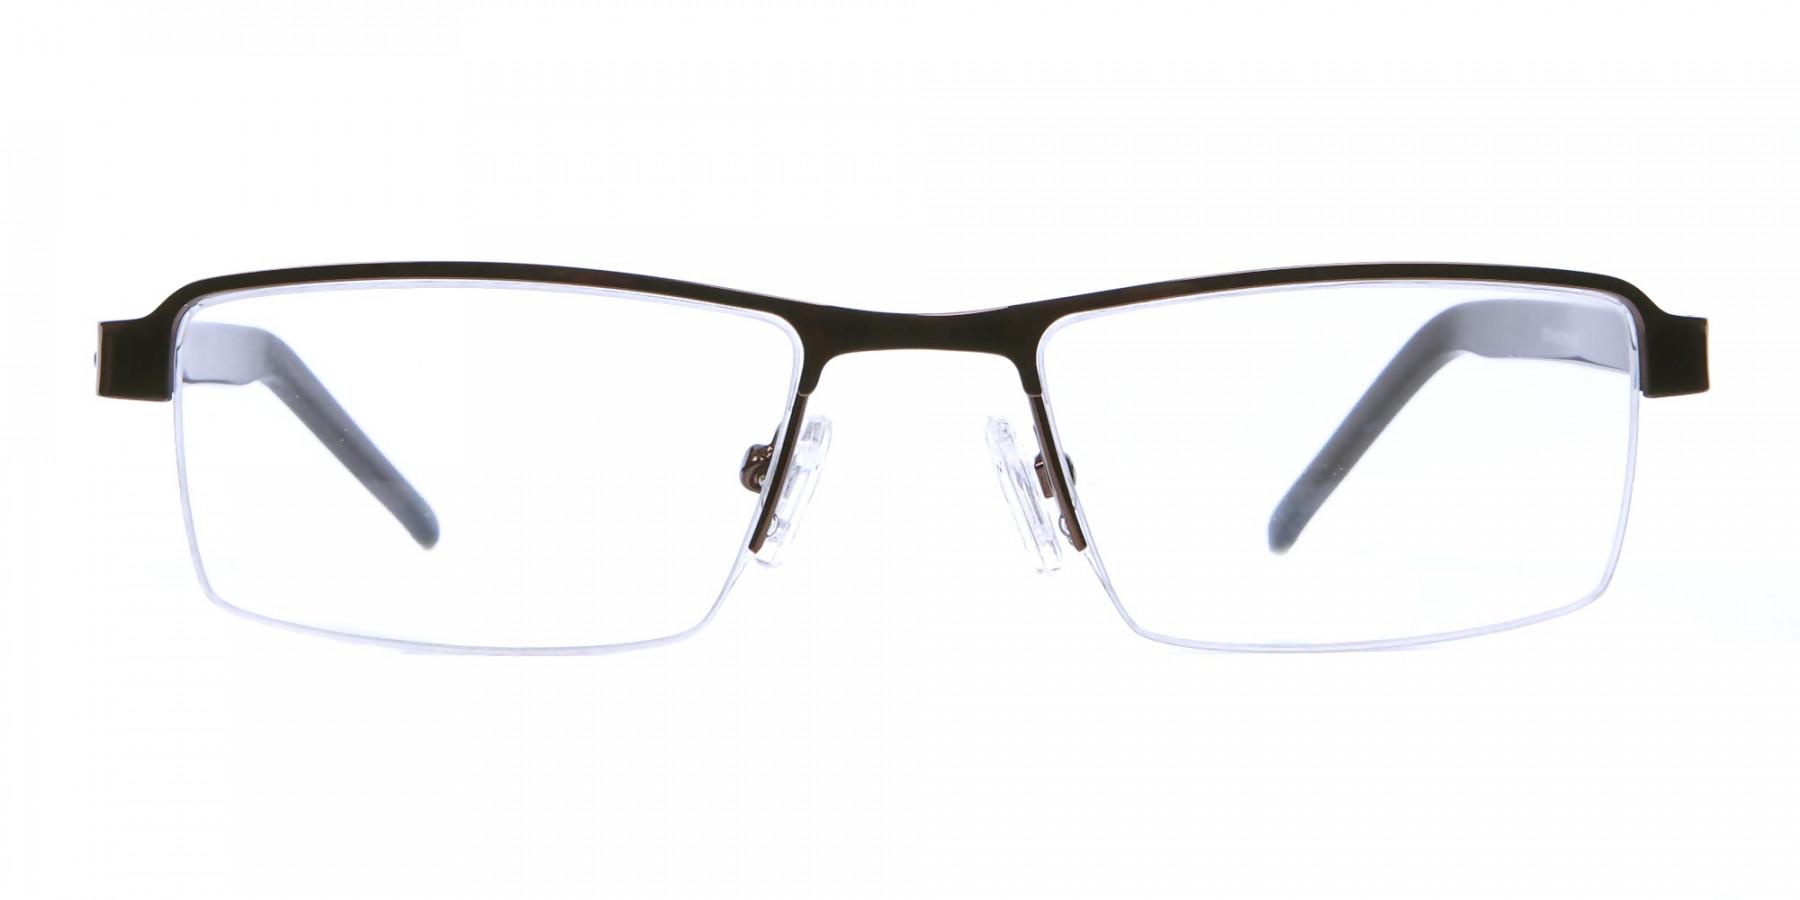 Brown Rectangular Glasses, Eyeglasses